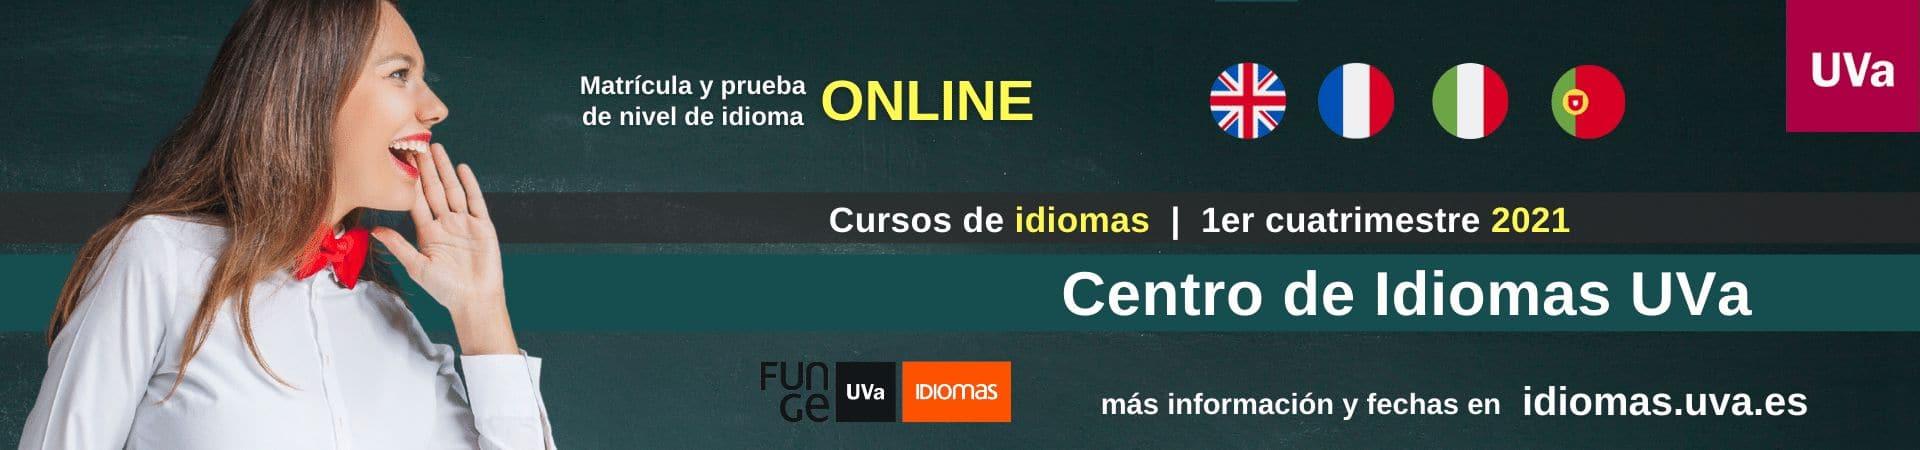 Banner cursos de idiomas UVa - 1er cuatrimestre 2021